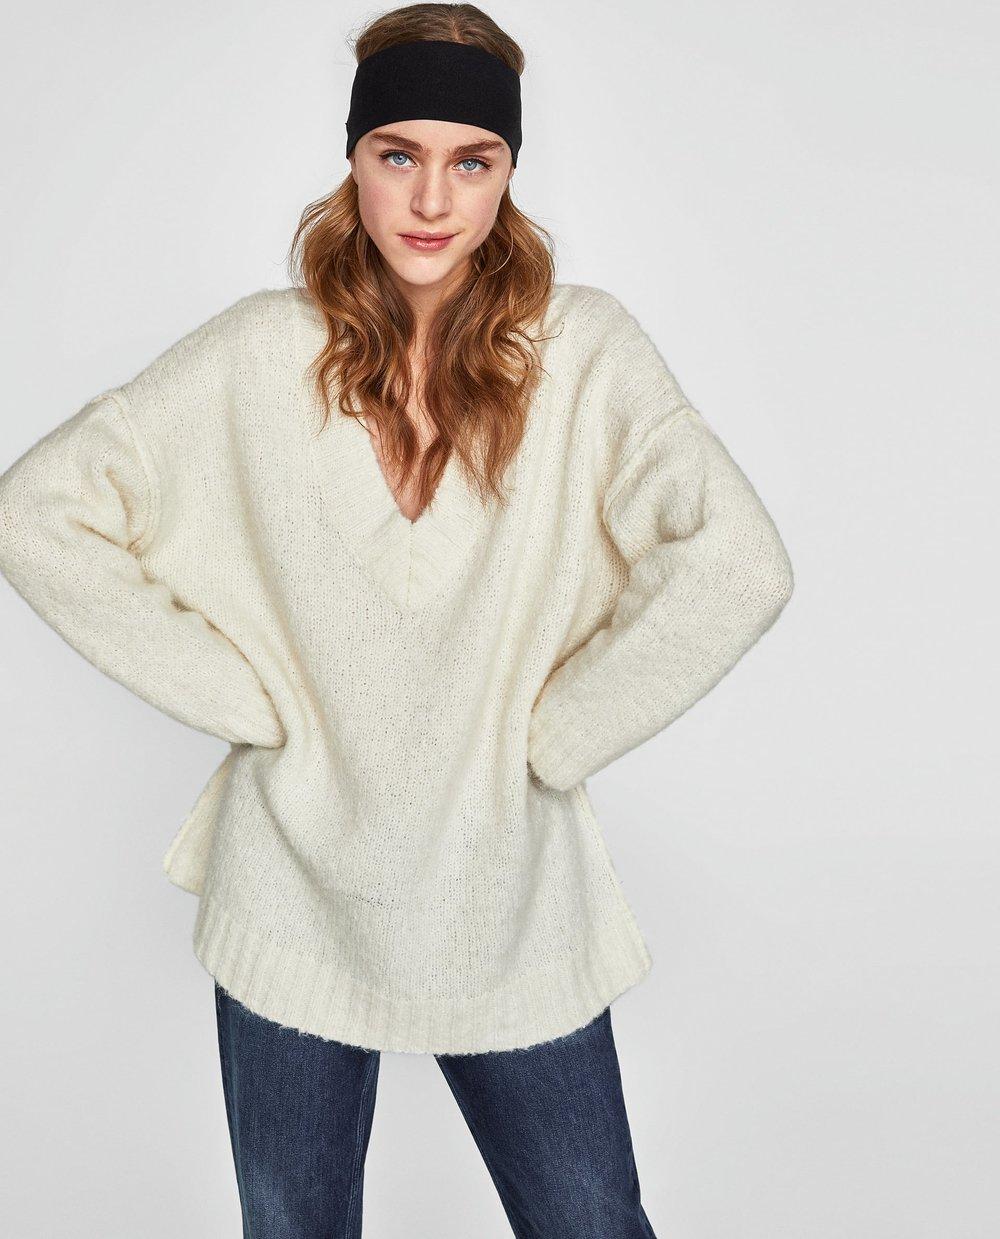 ZARA Oversized sweater with seam detail $59.95